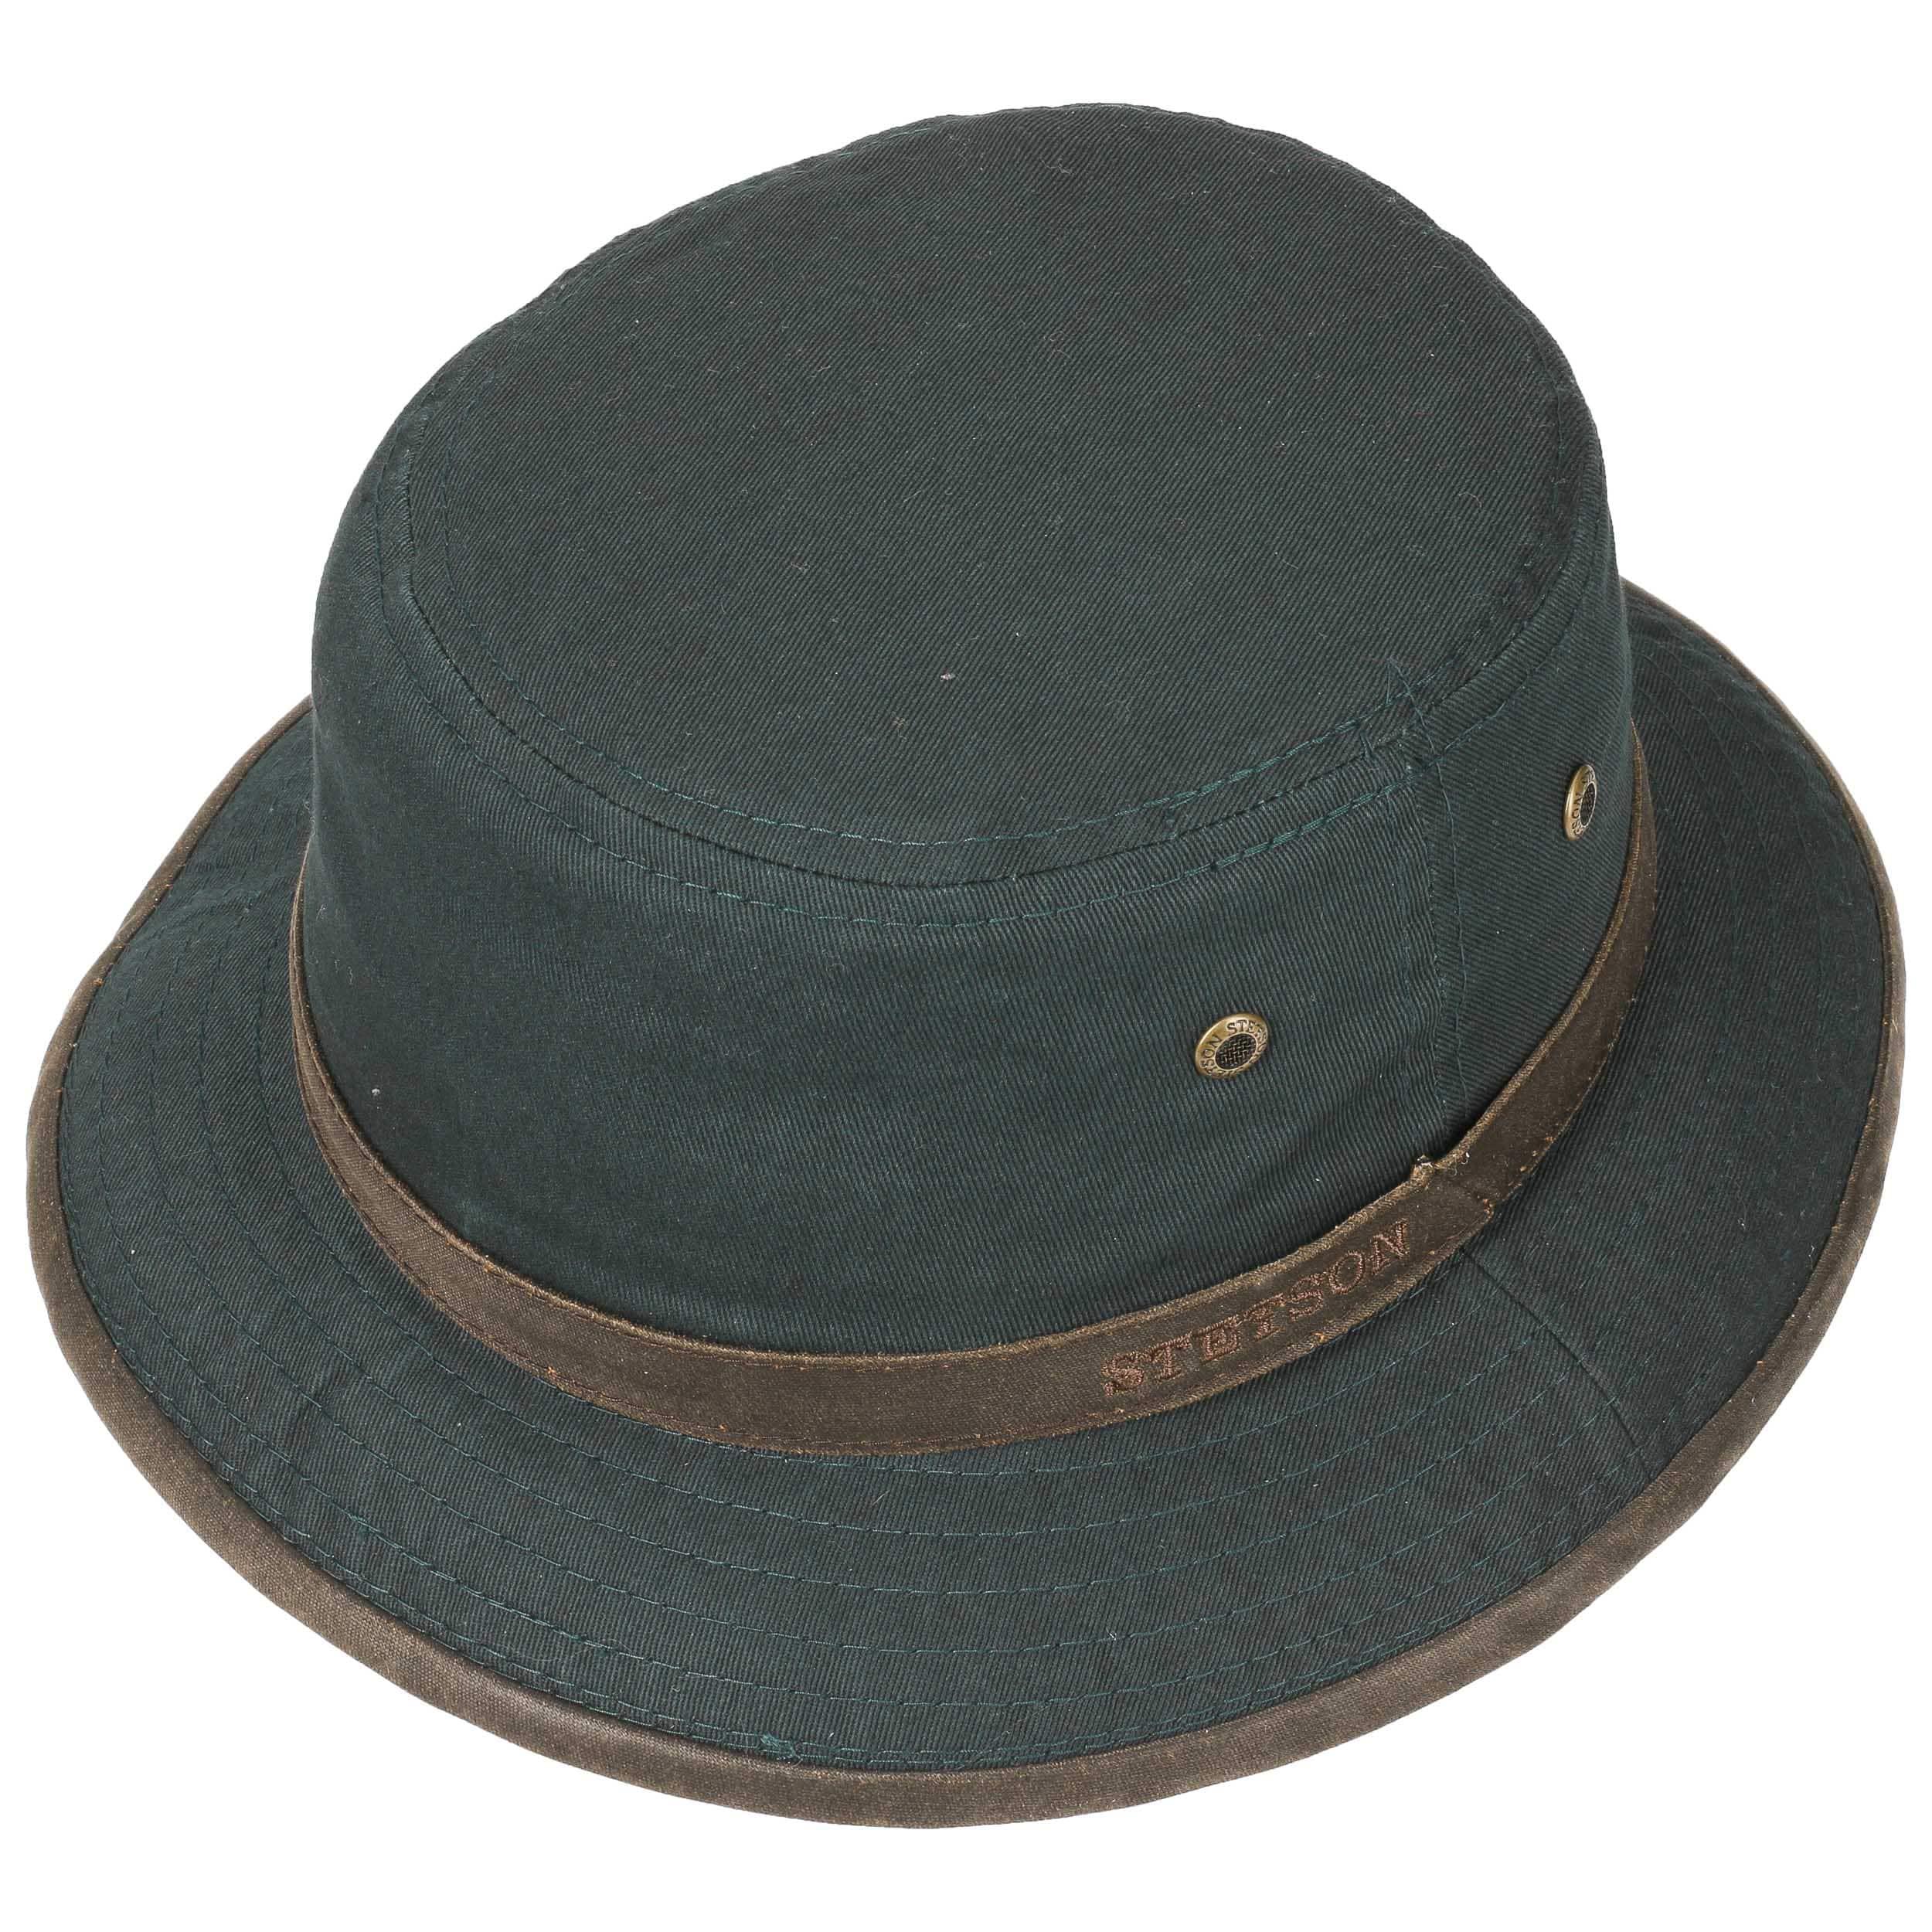 ... Washed Anti UV Bucket Hat by Stetson - black 1 ... 3f59f2fe3bc